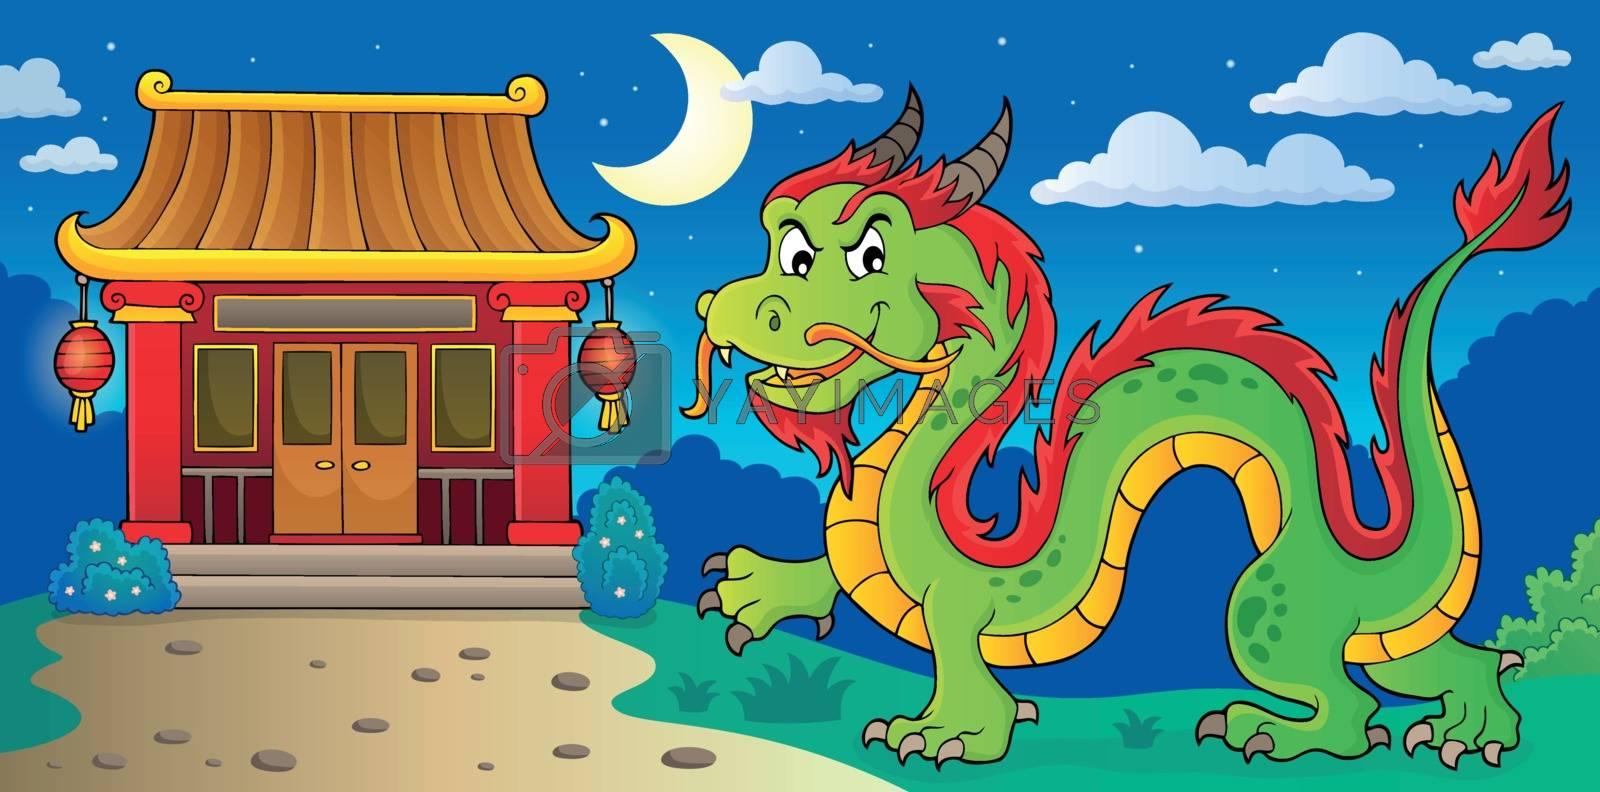 Chinese dragon theme image 4 - eps10 vector illustration.